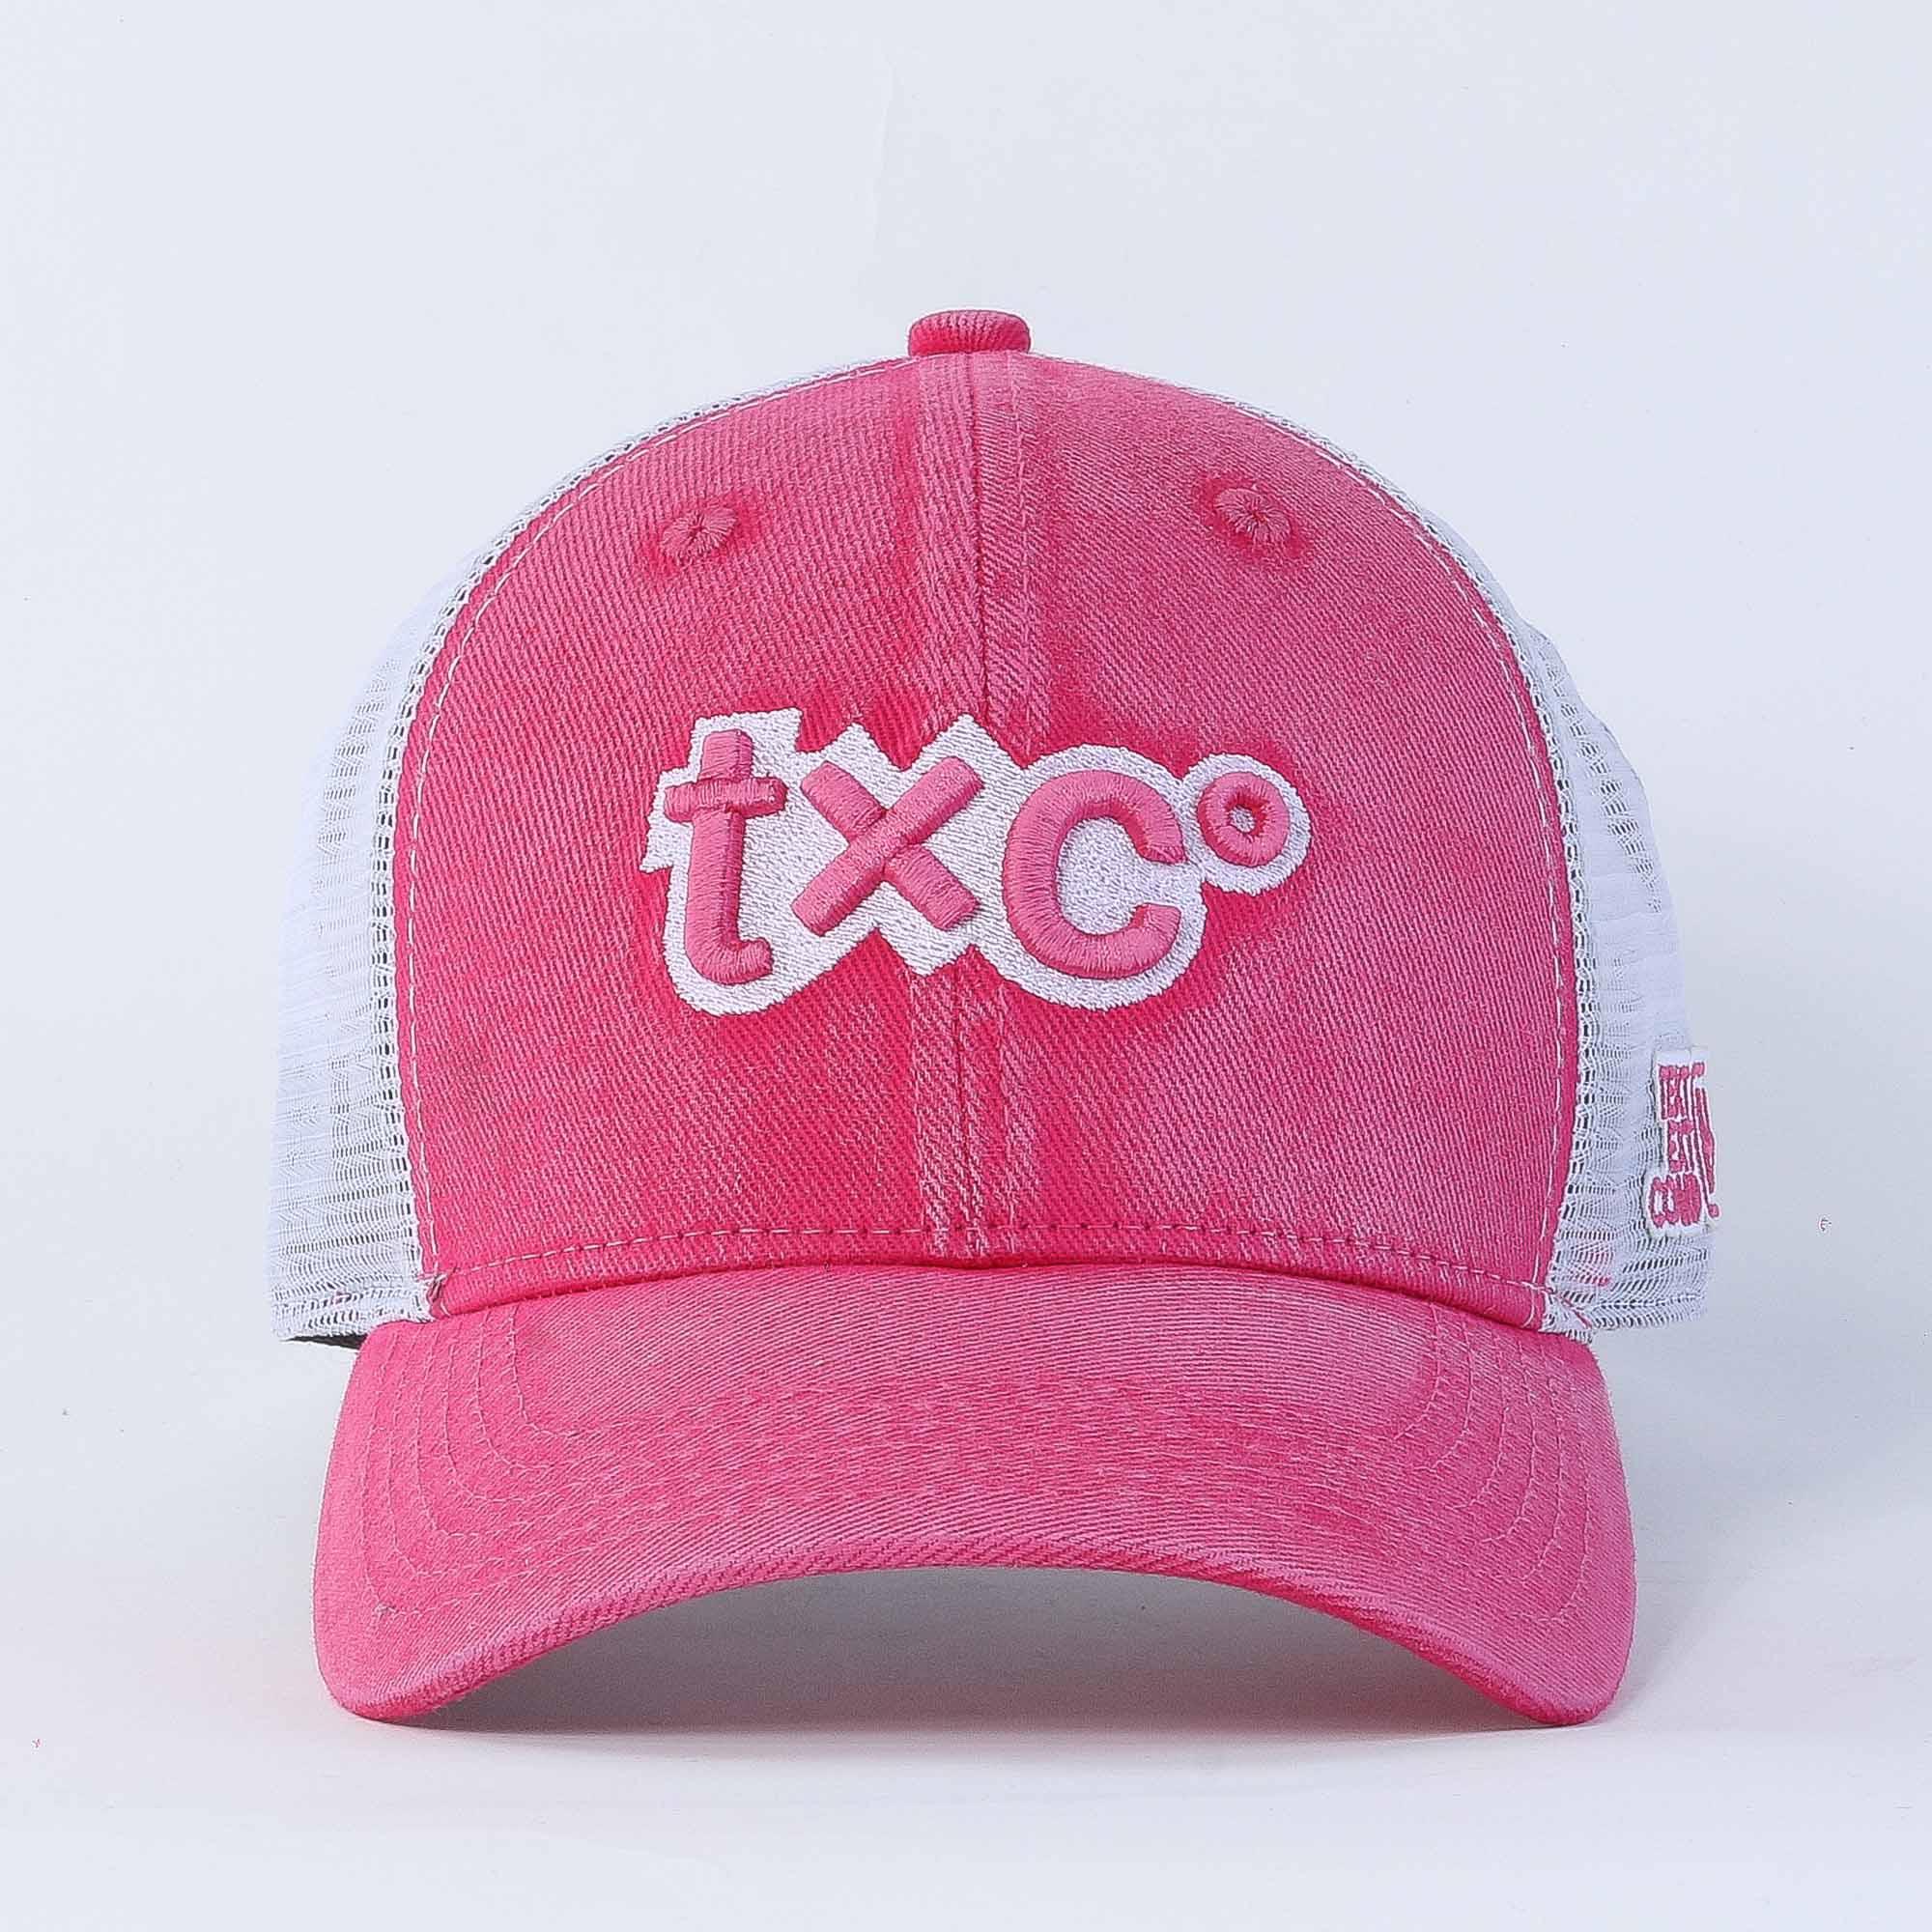 Boné TXC Brand aba curva 713C